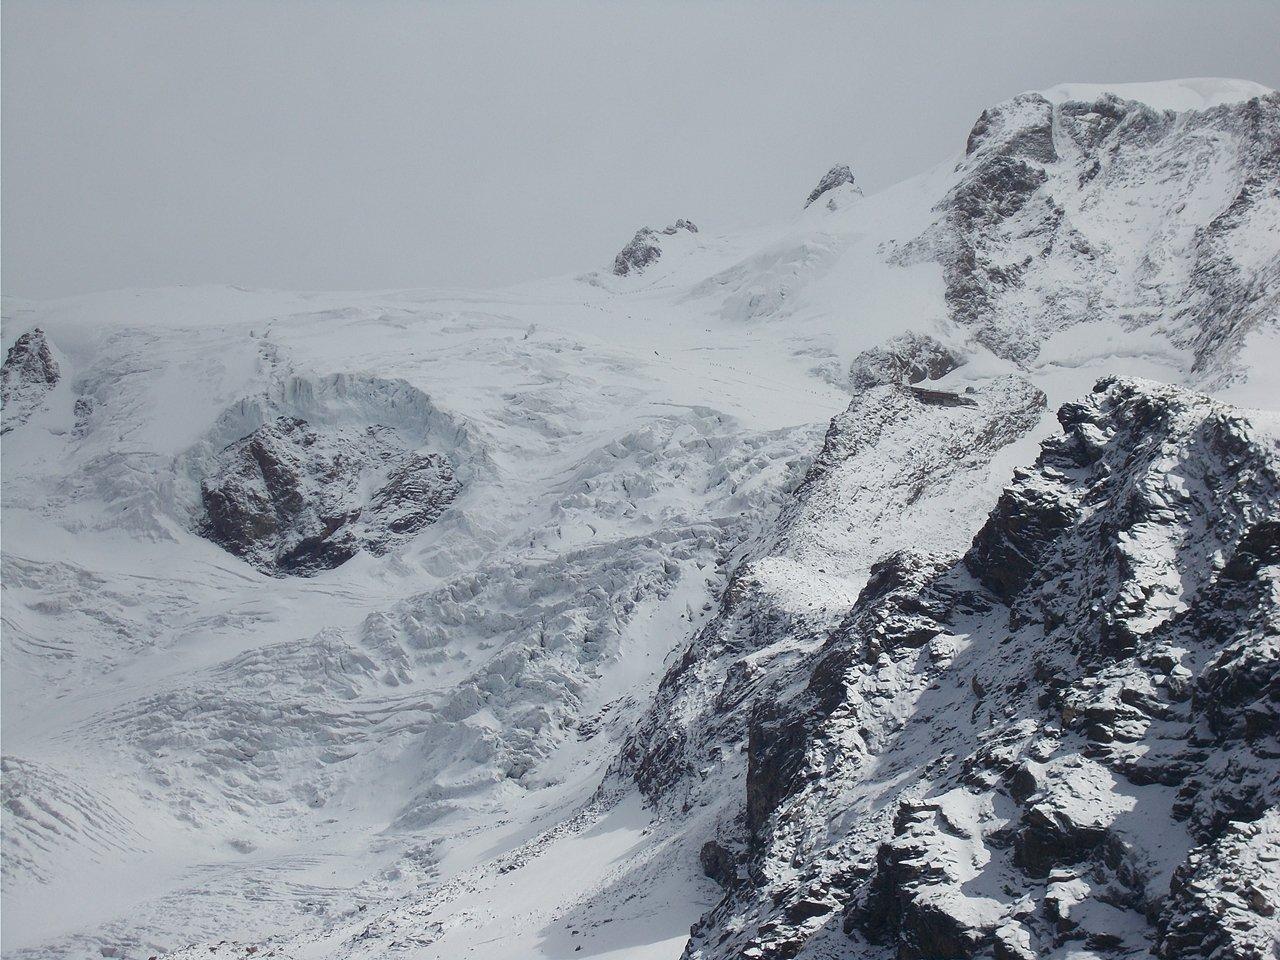 ghiacciaio del Lys